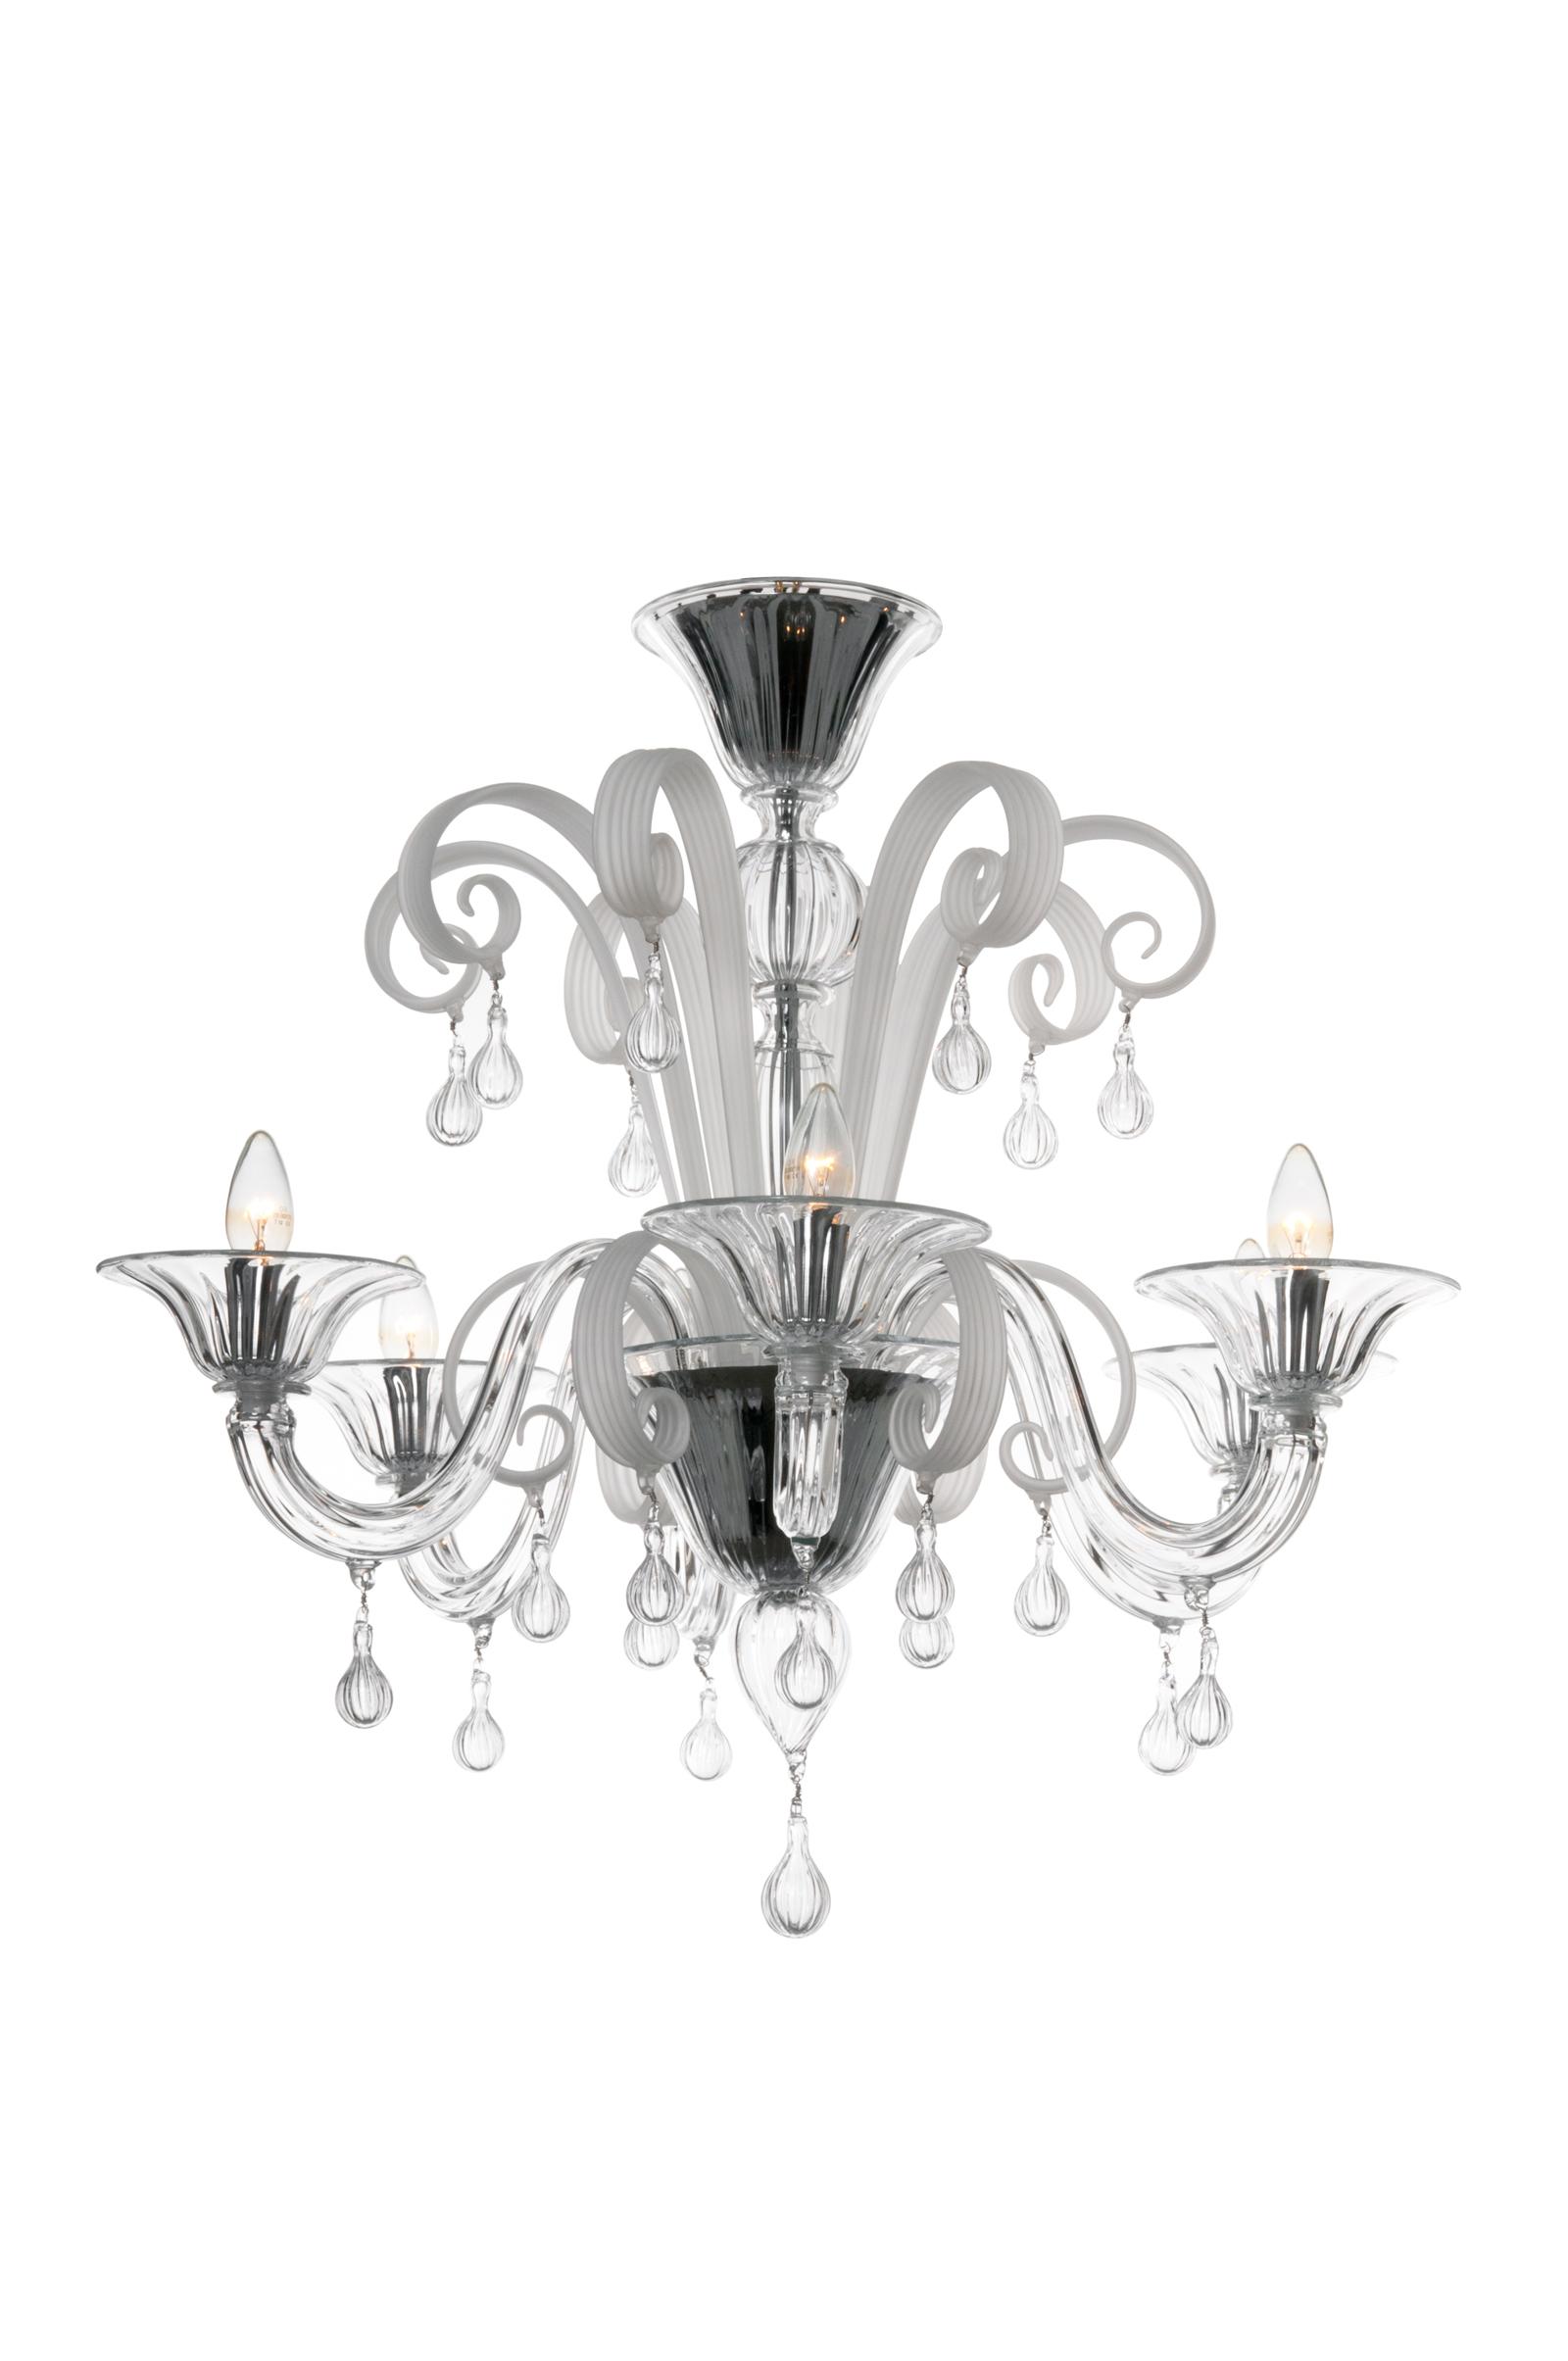 Soie-lustre-chandelier-veronese-11.jpg